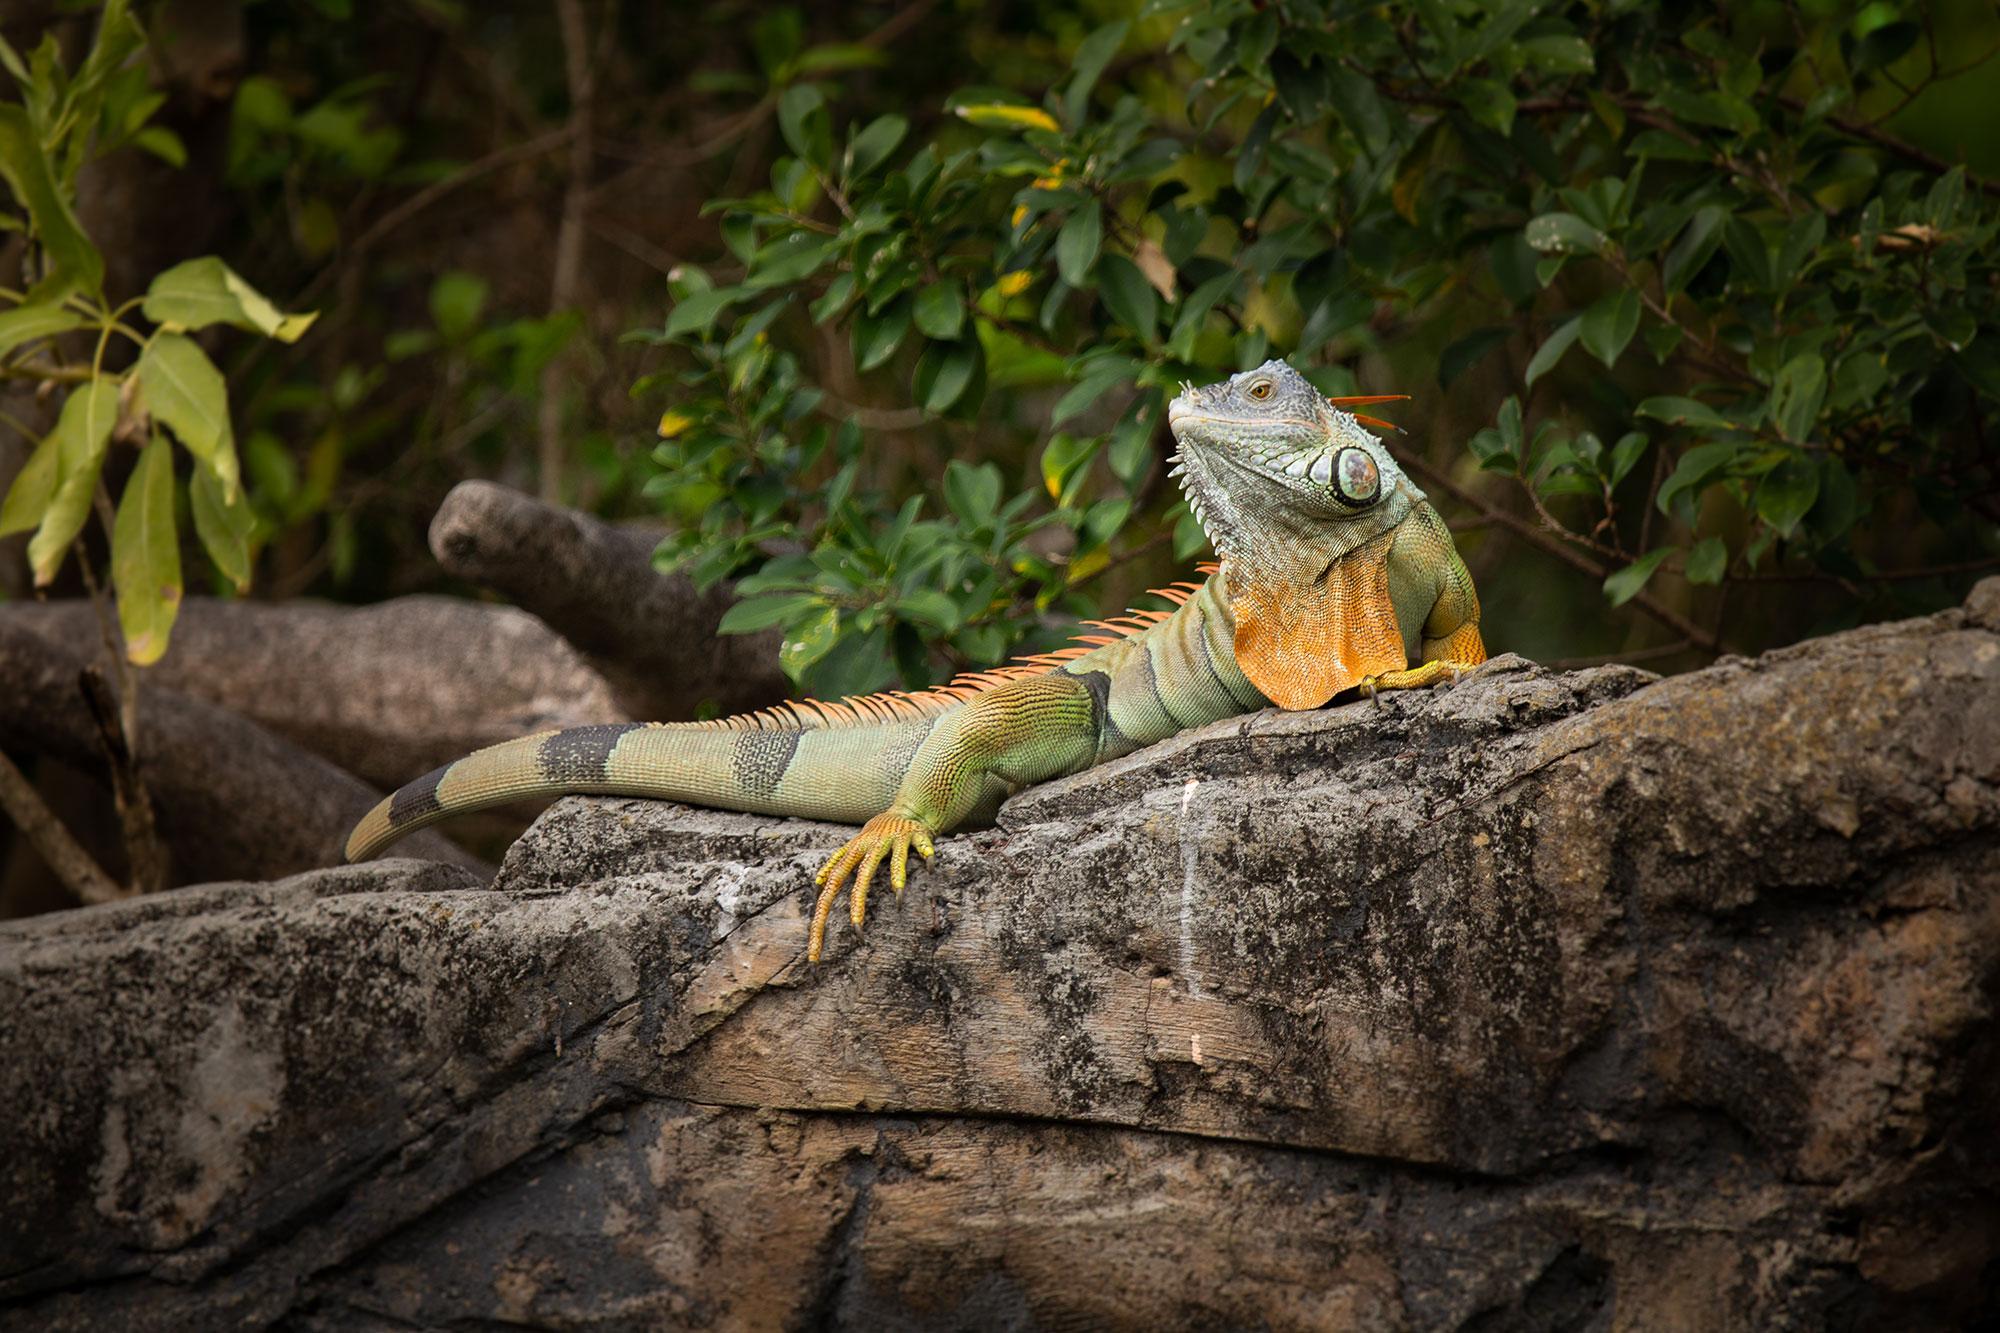 Iguana Sunning on a Rock